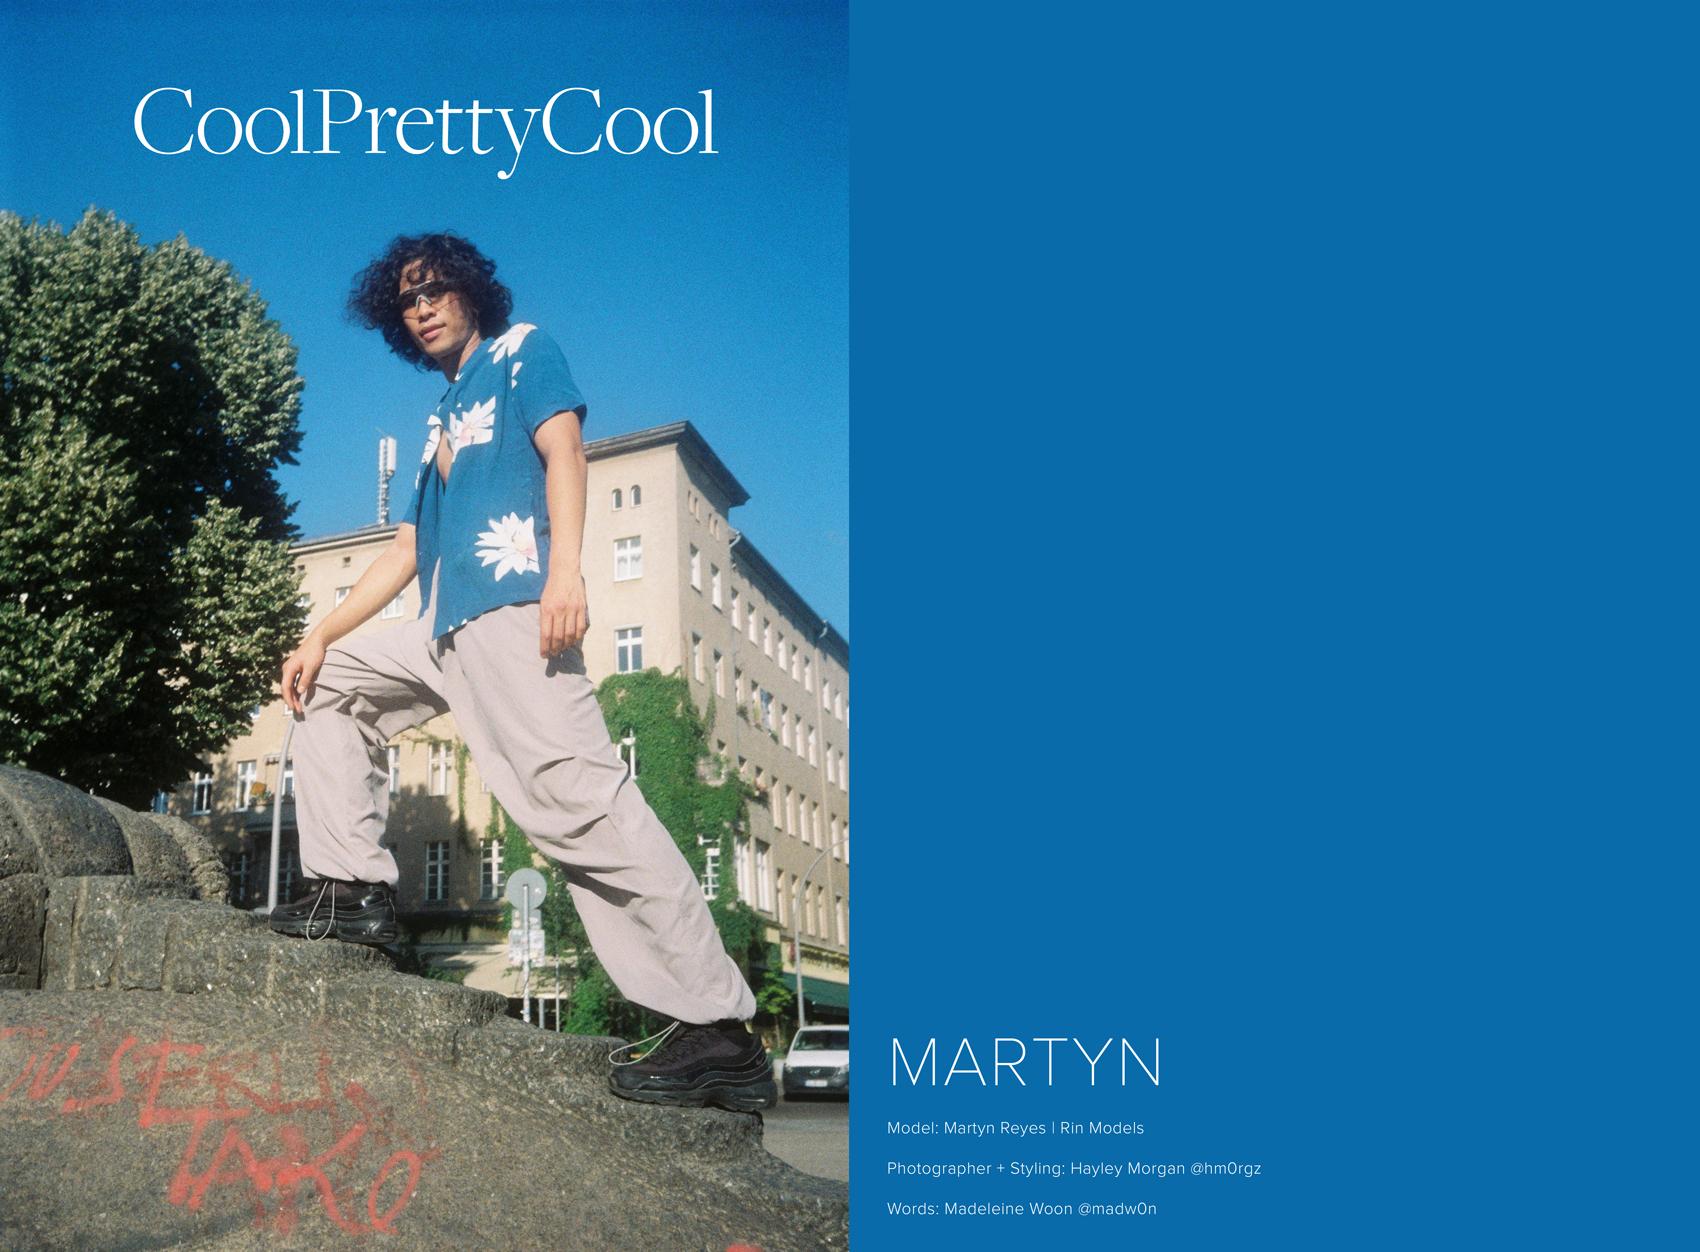 COOL-PRETTY-COOL-Martyn-Reyes-Berlin-Hayley-Morgan_banner.jpg